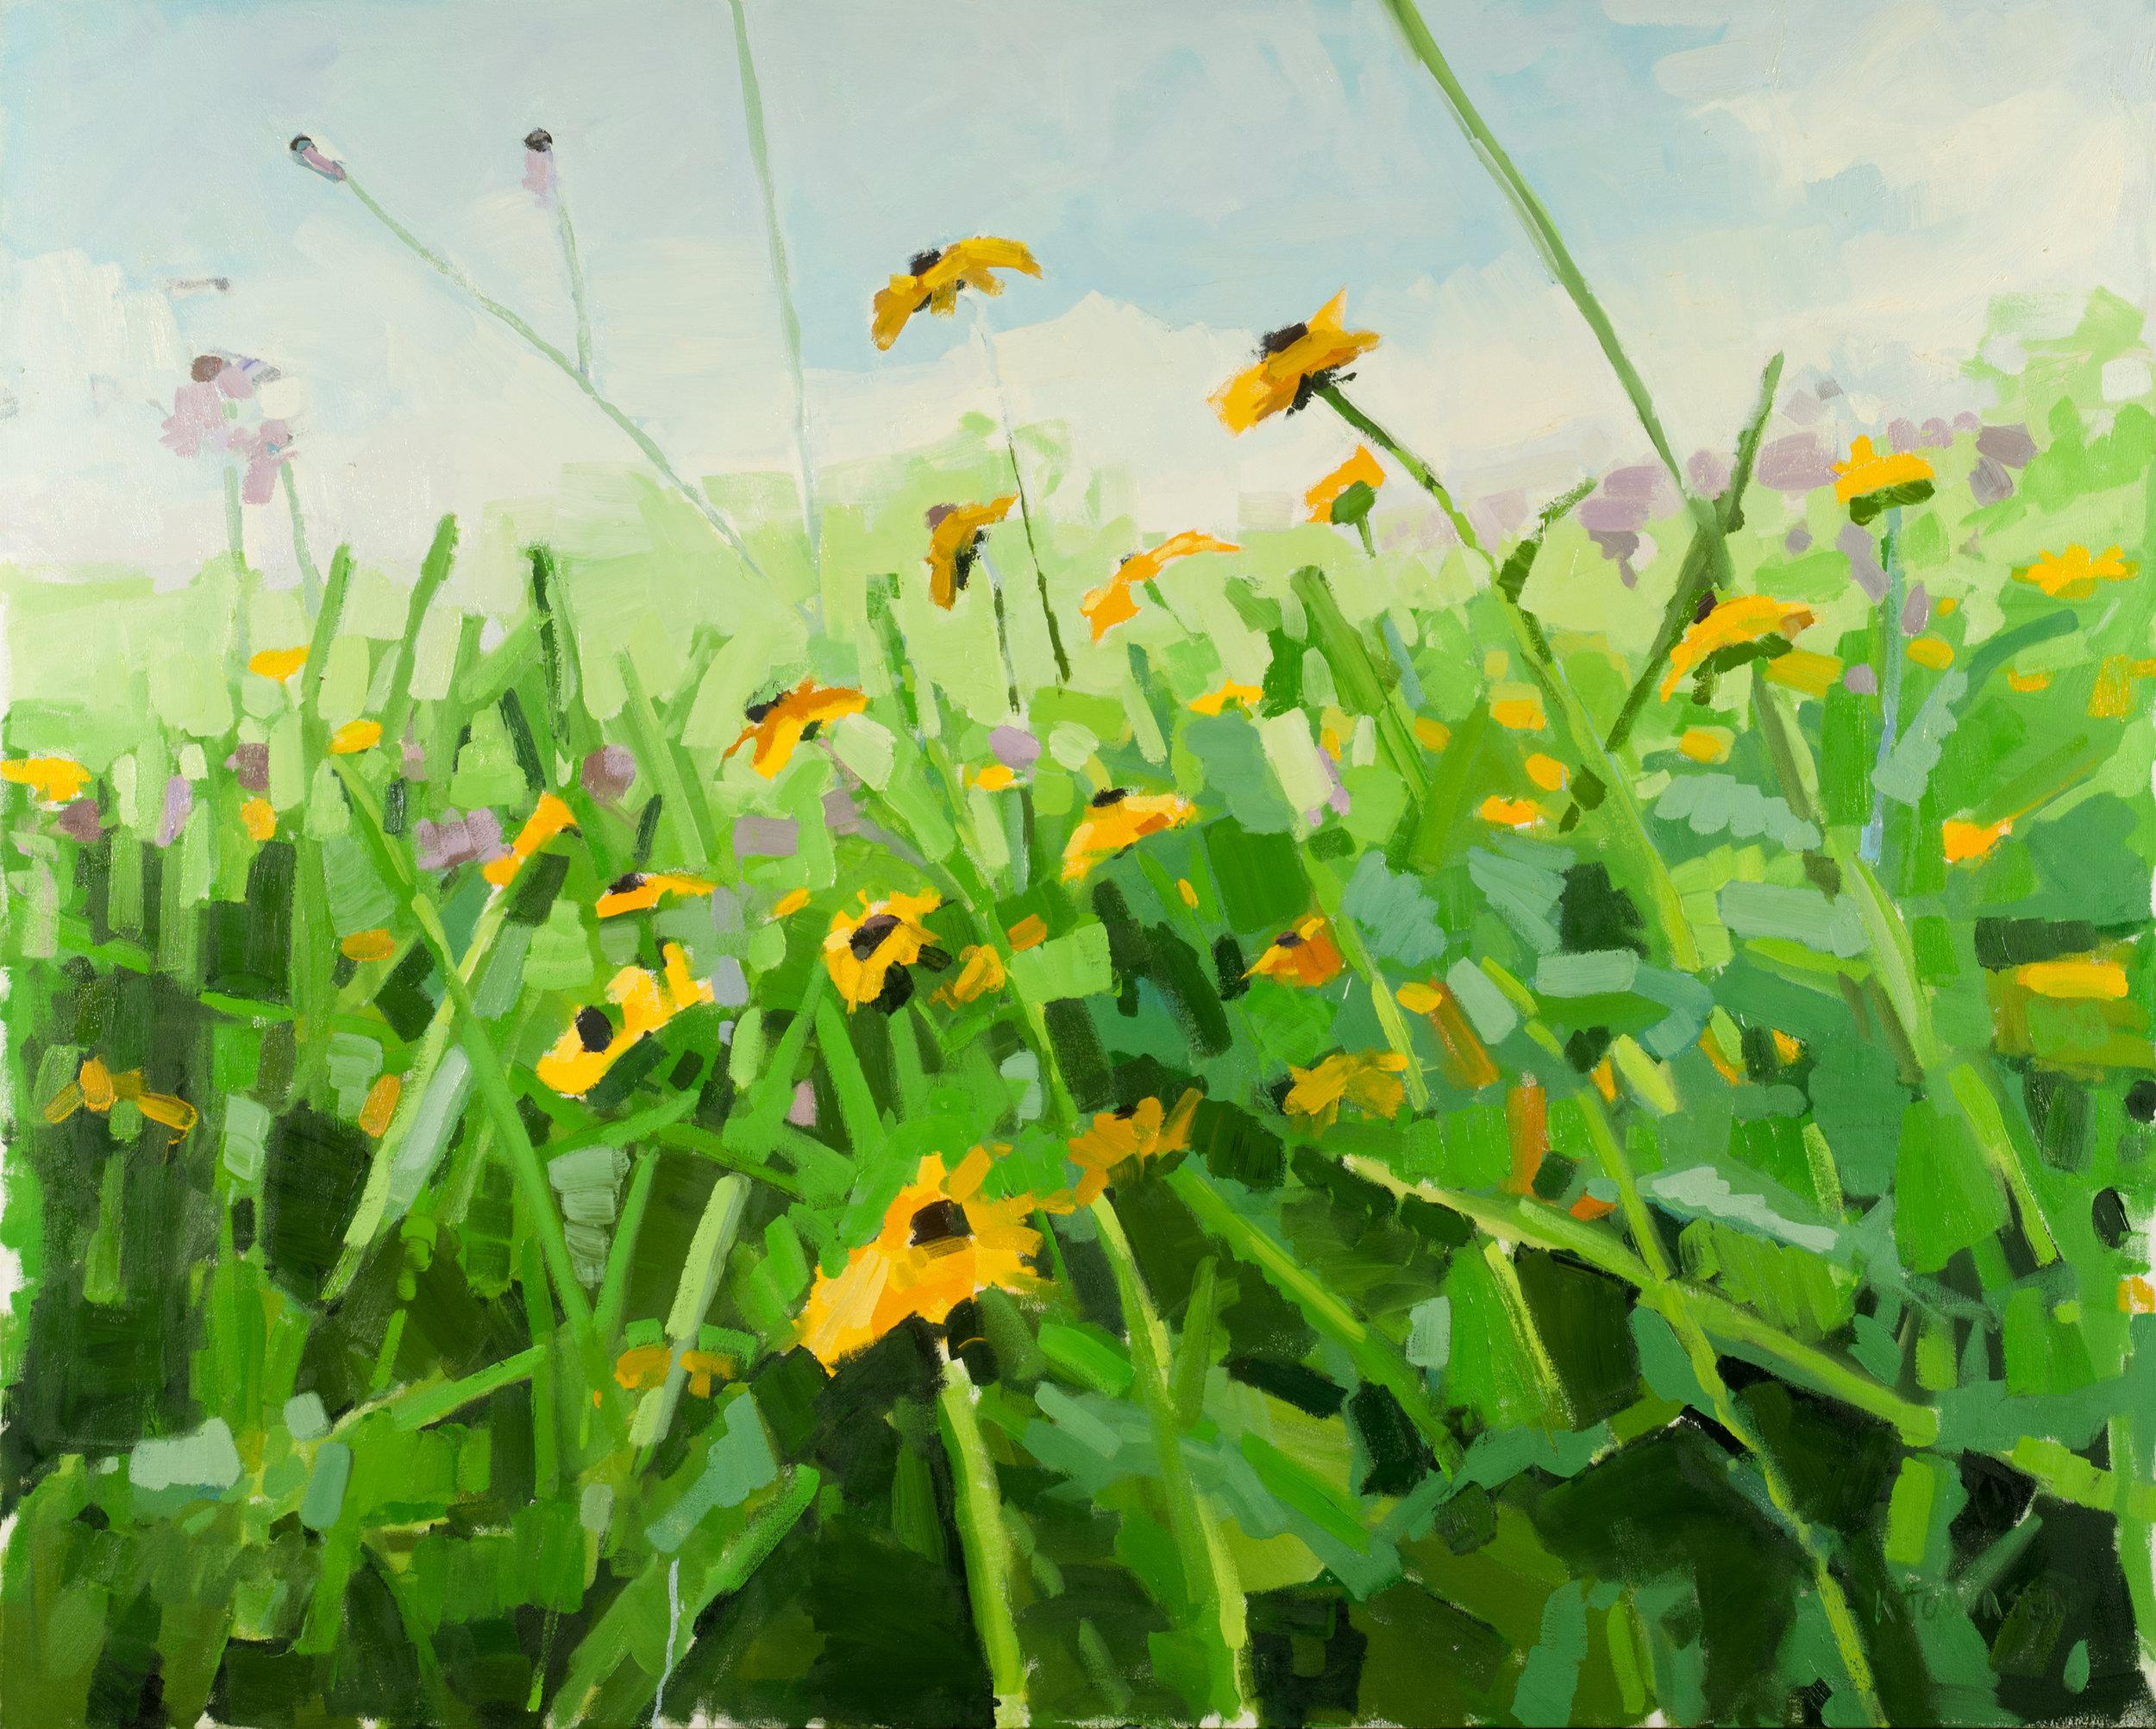 WildflowerMeadowII(WithHorizon)-48x60inches-OilOnCanvas-2017.jpg